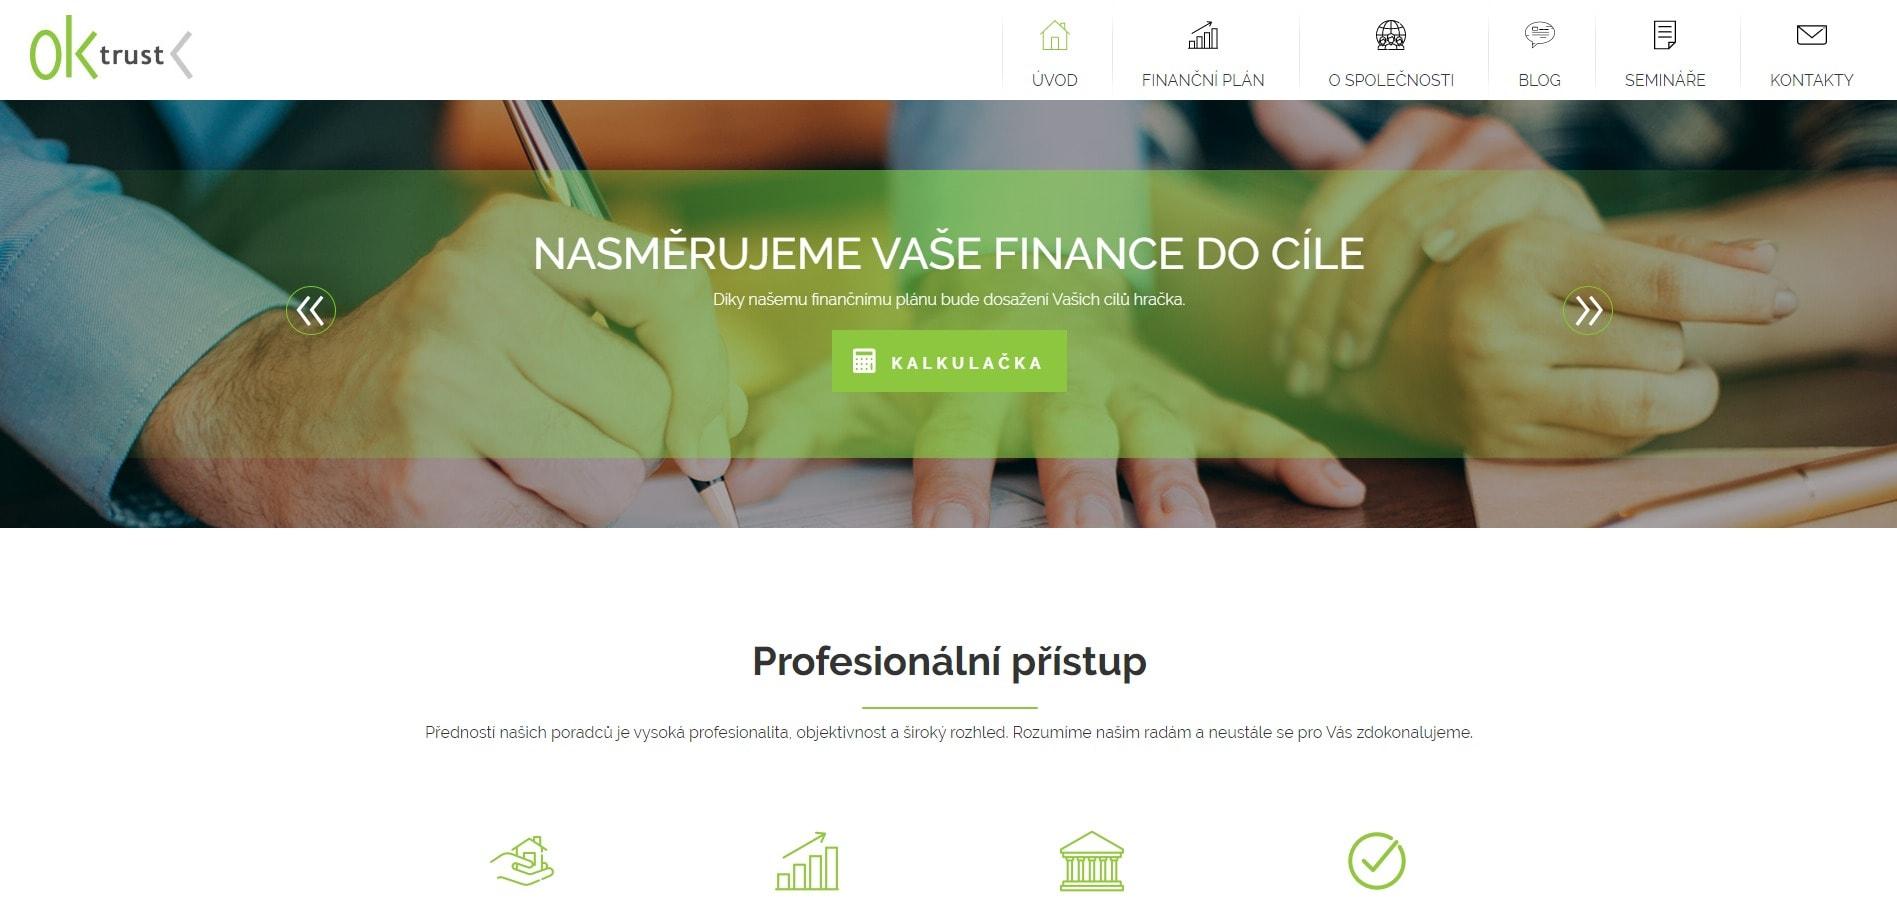 OKtrust – finance